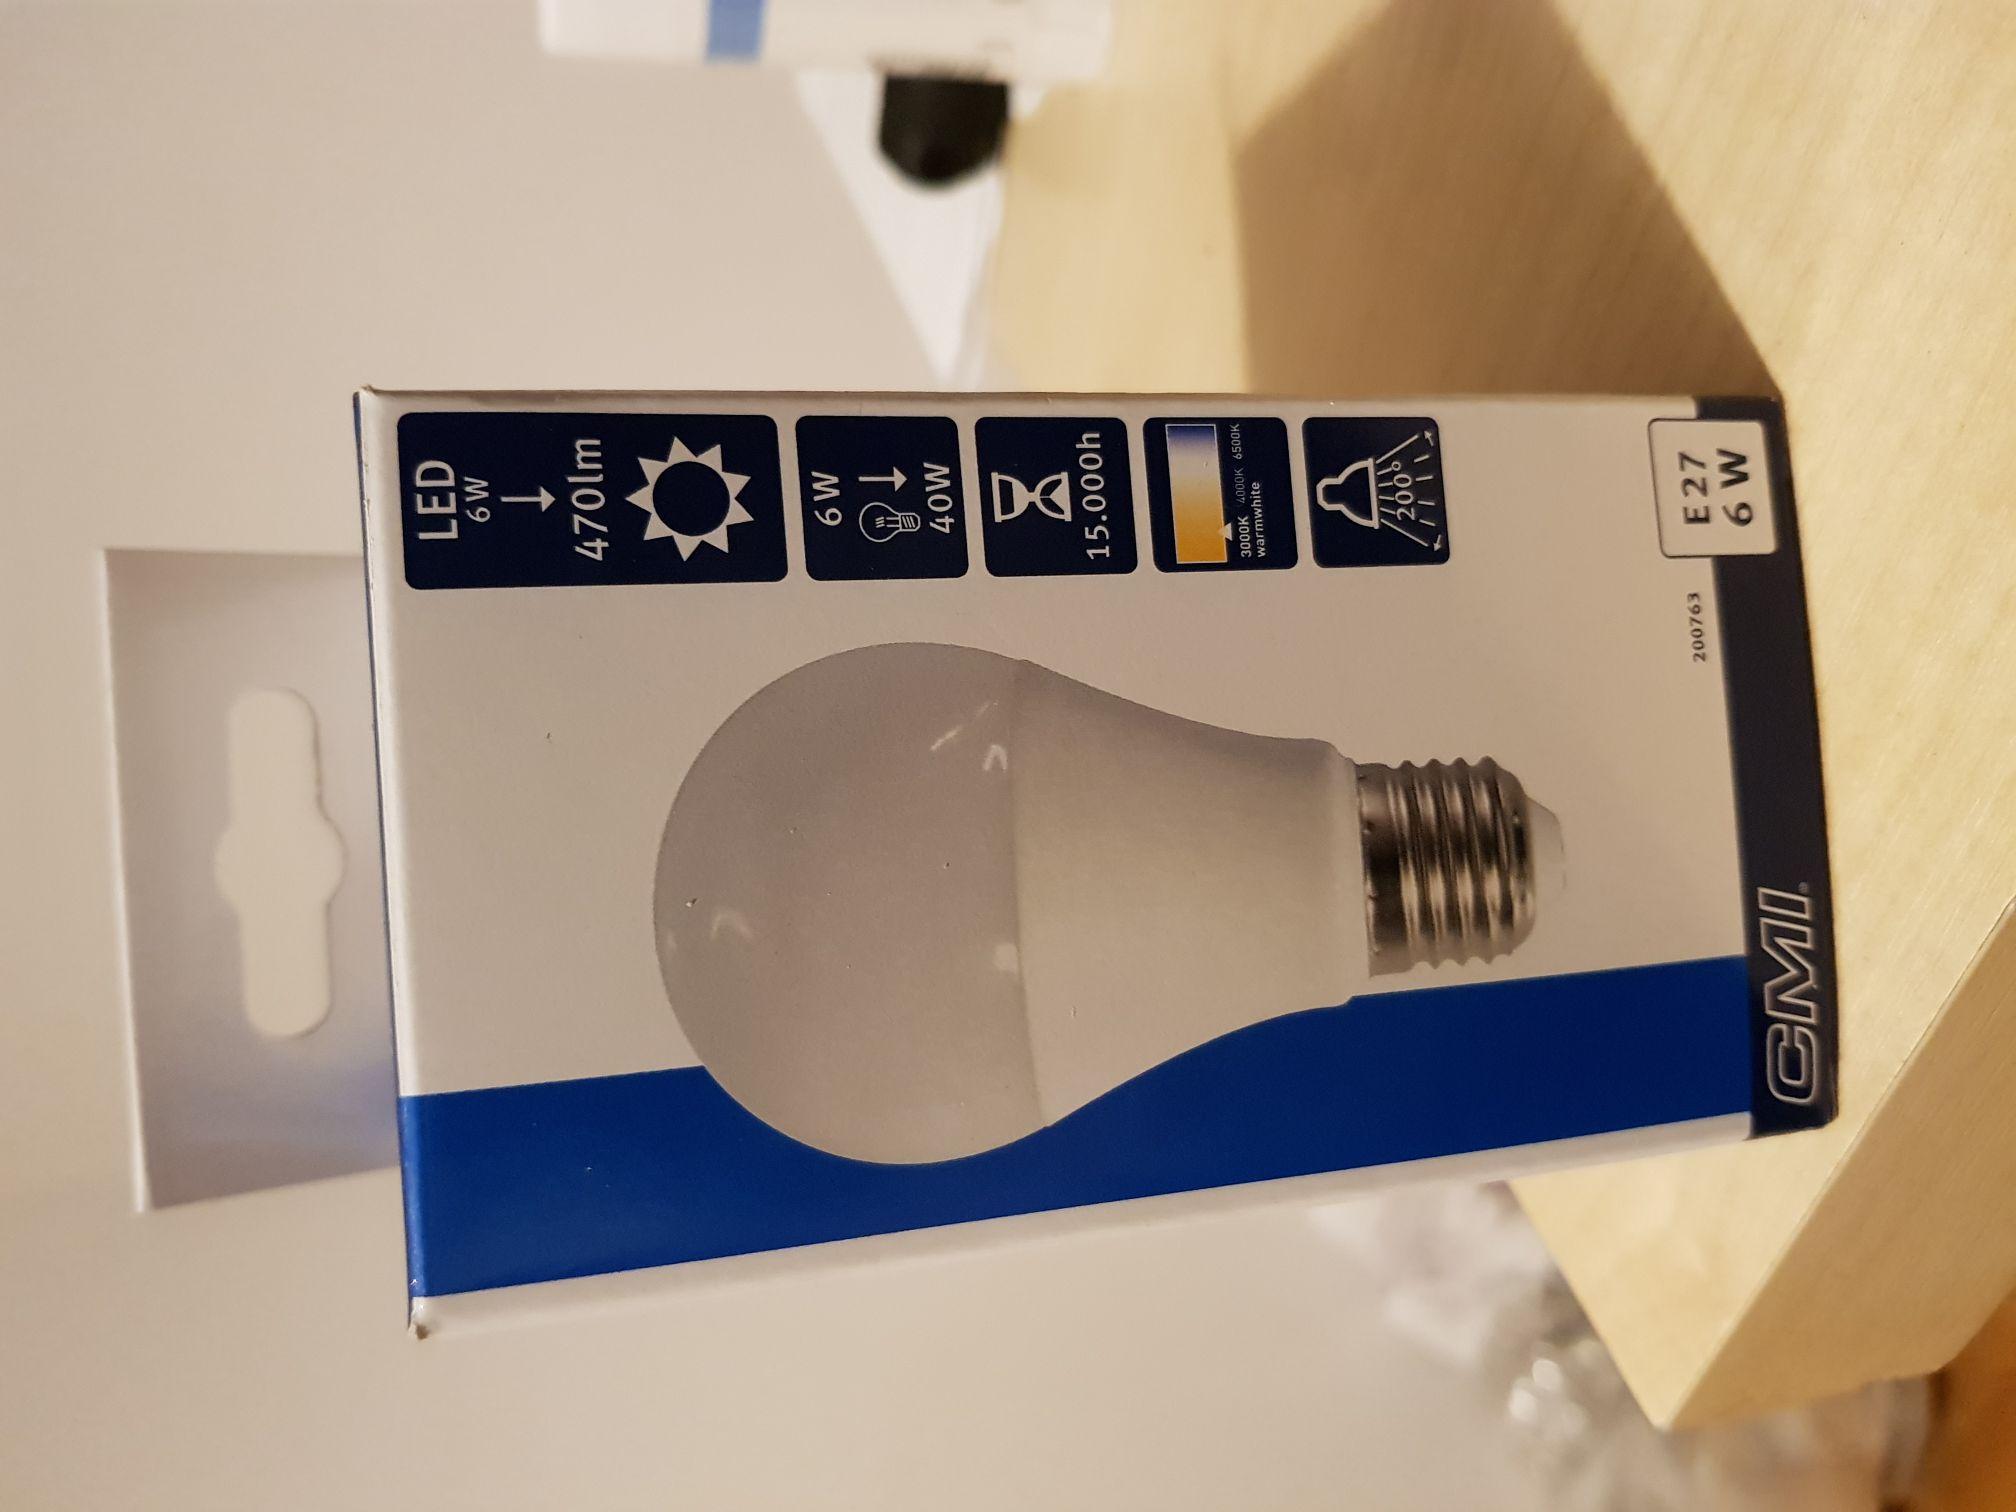 Żarówka LED, 6W, 470lm, 15.000h, 3000K, Obi